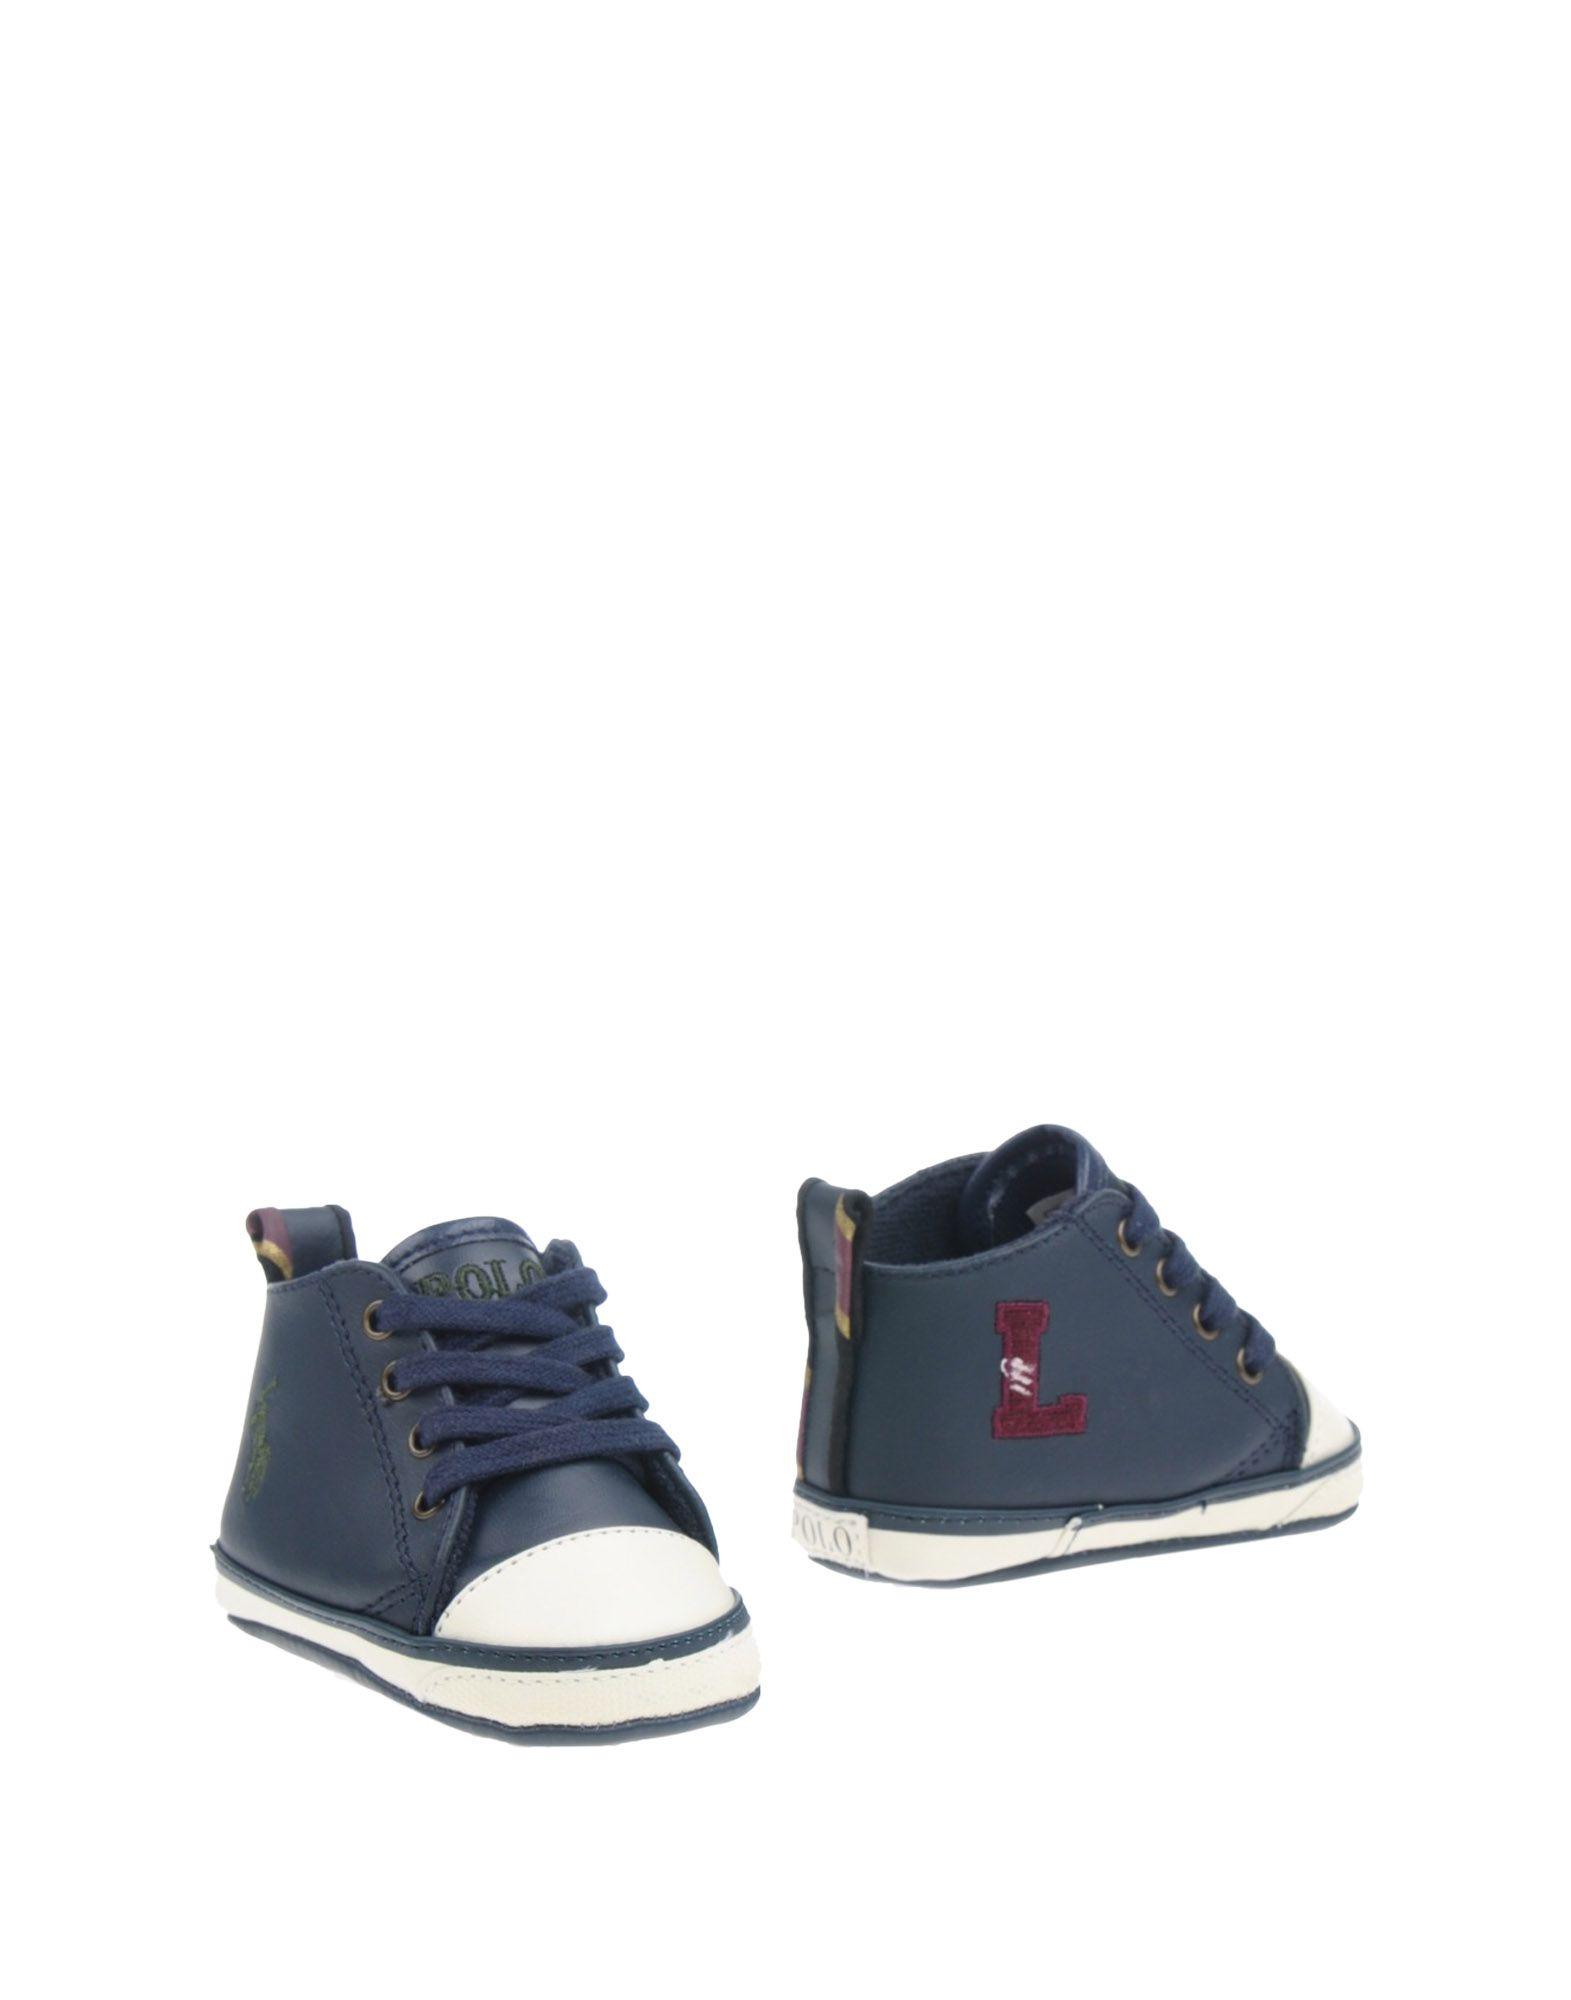 887c95189 Ralph Lauren Newborn Shoes Boy 0-24 months online on YOOX Portugal